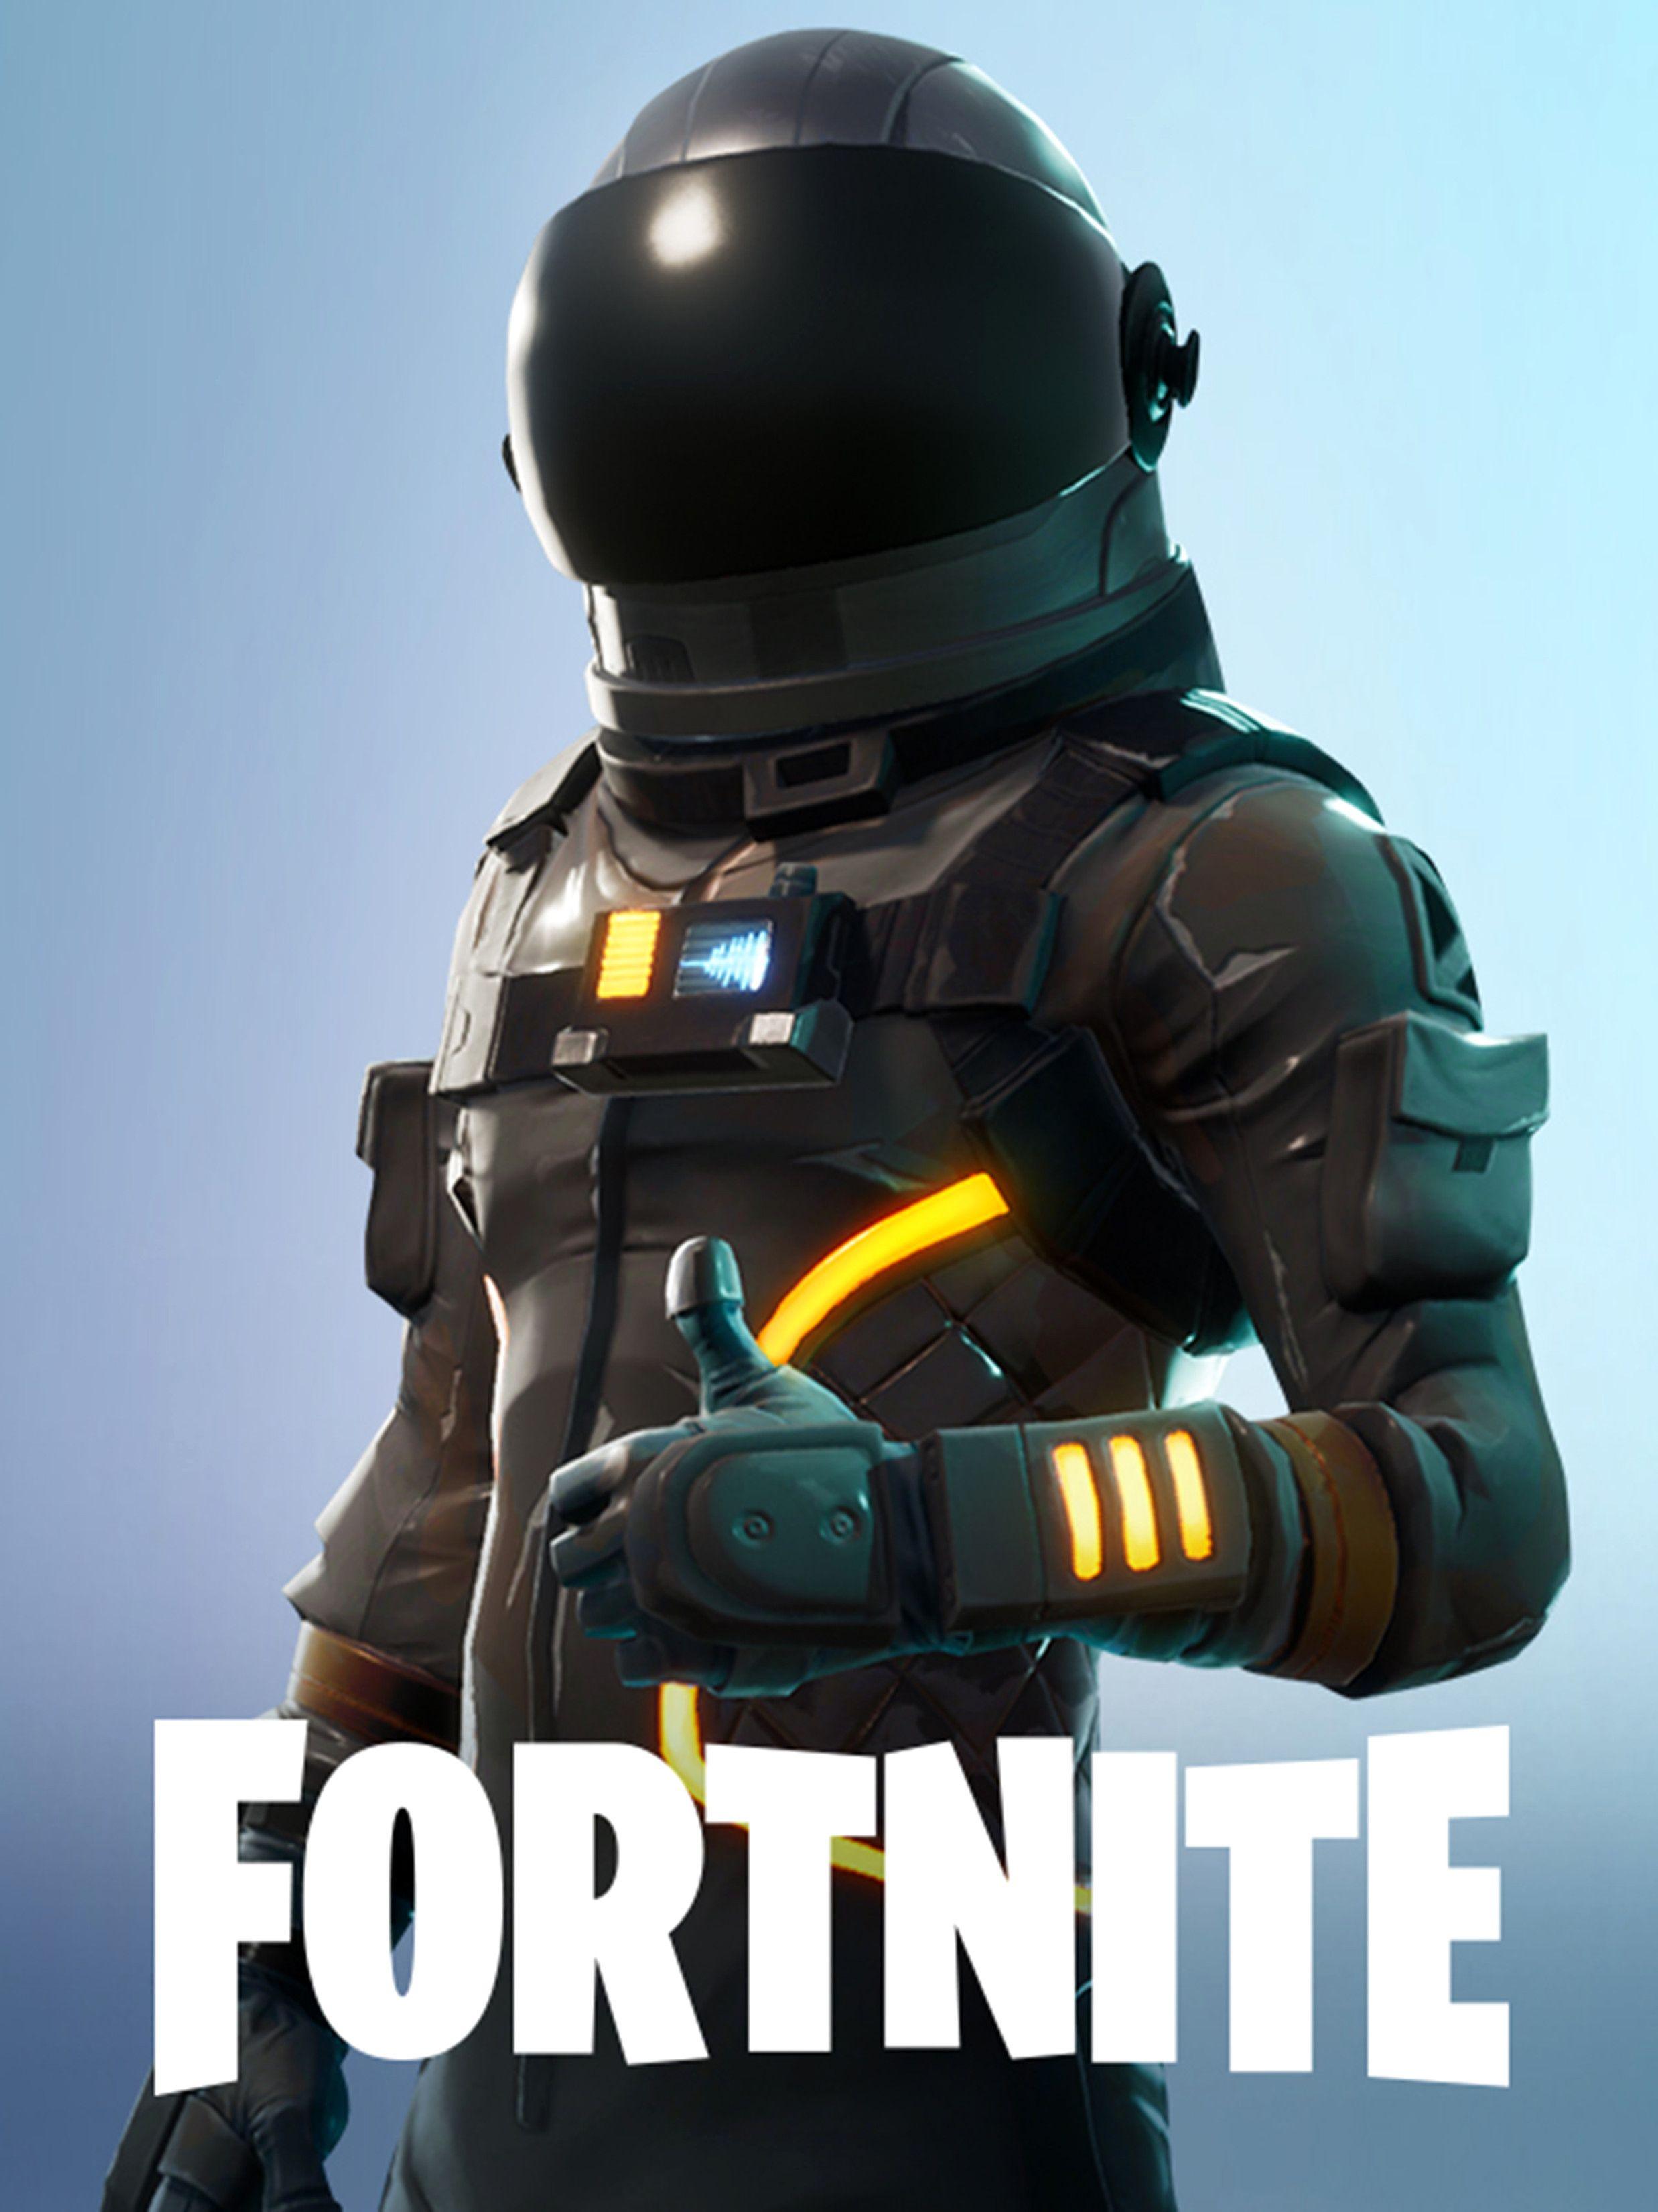 Hd Fortnite Wallpapers Fortnite Epic Games Fortnite Sale Poster